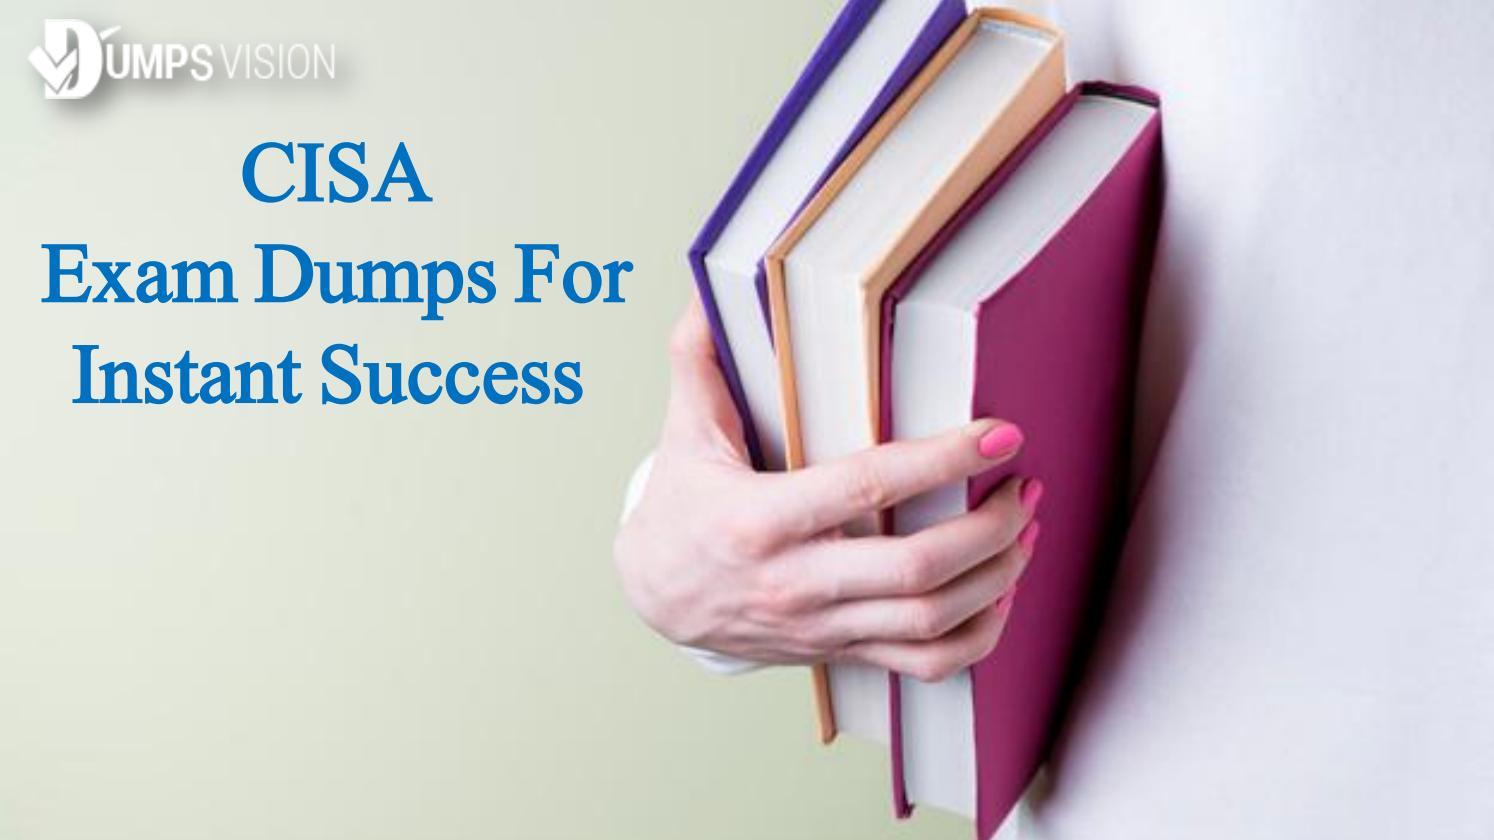 Study material pdf cisa